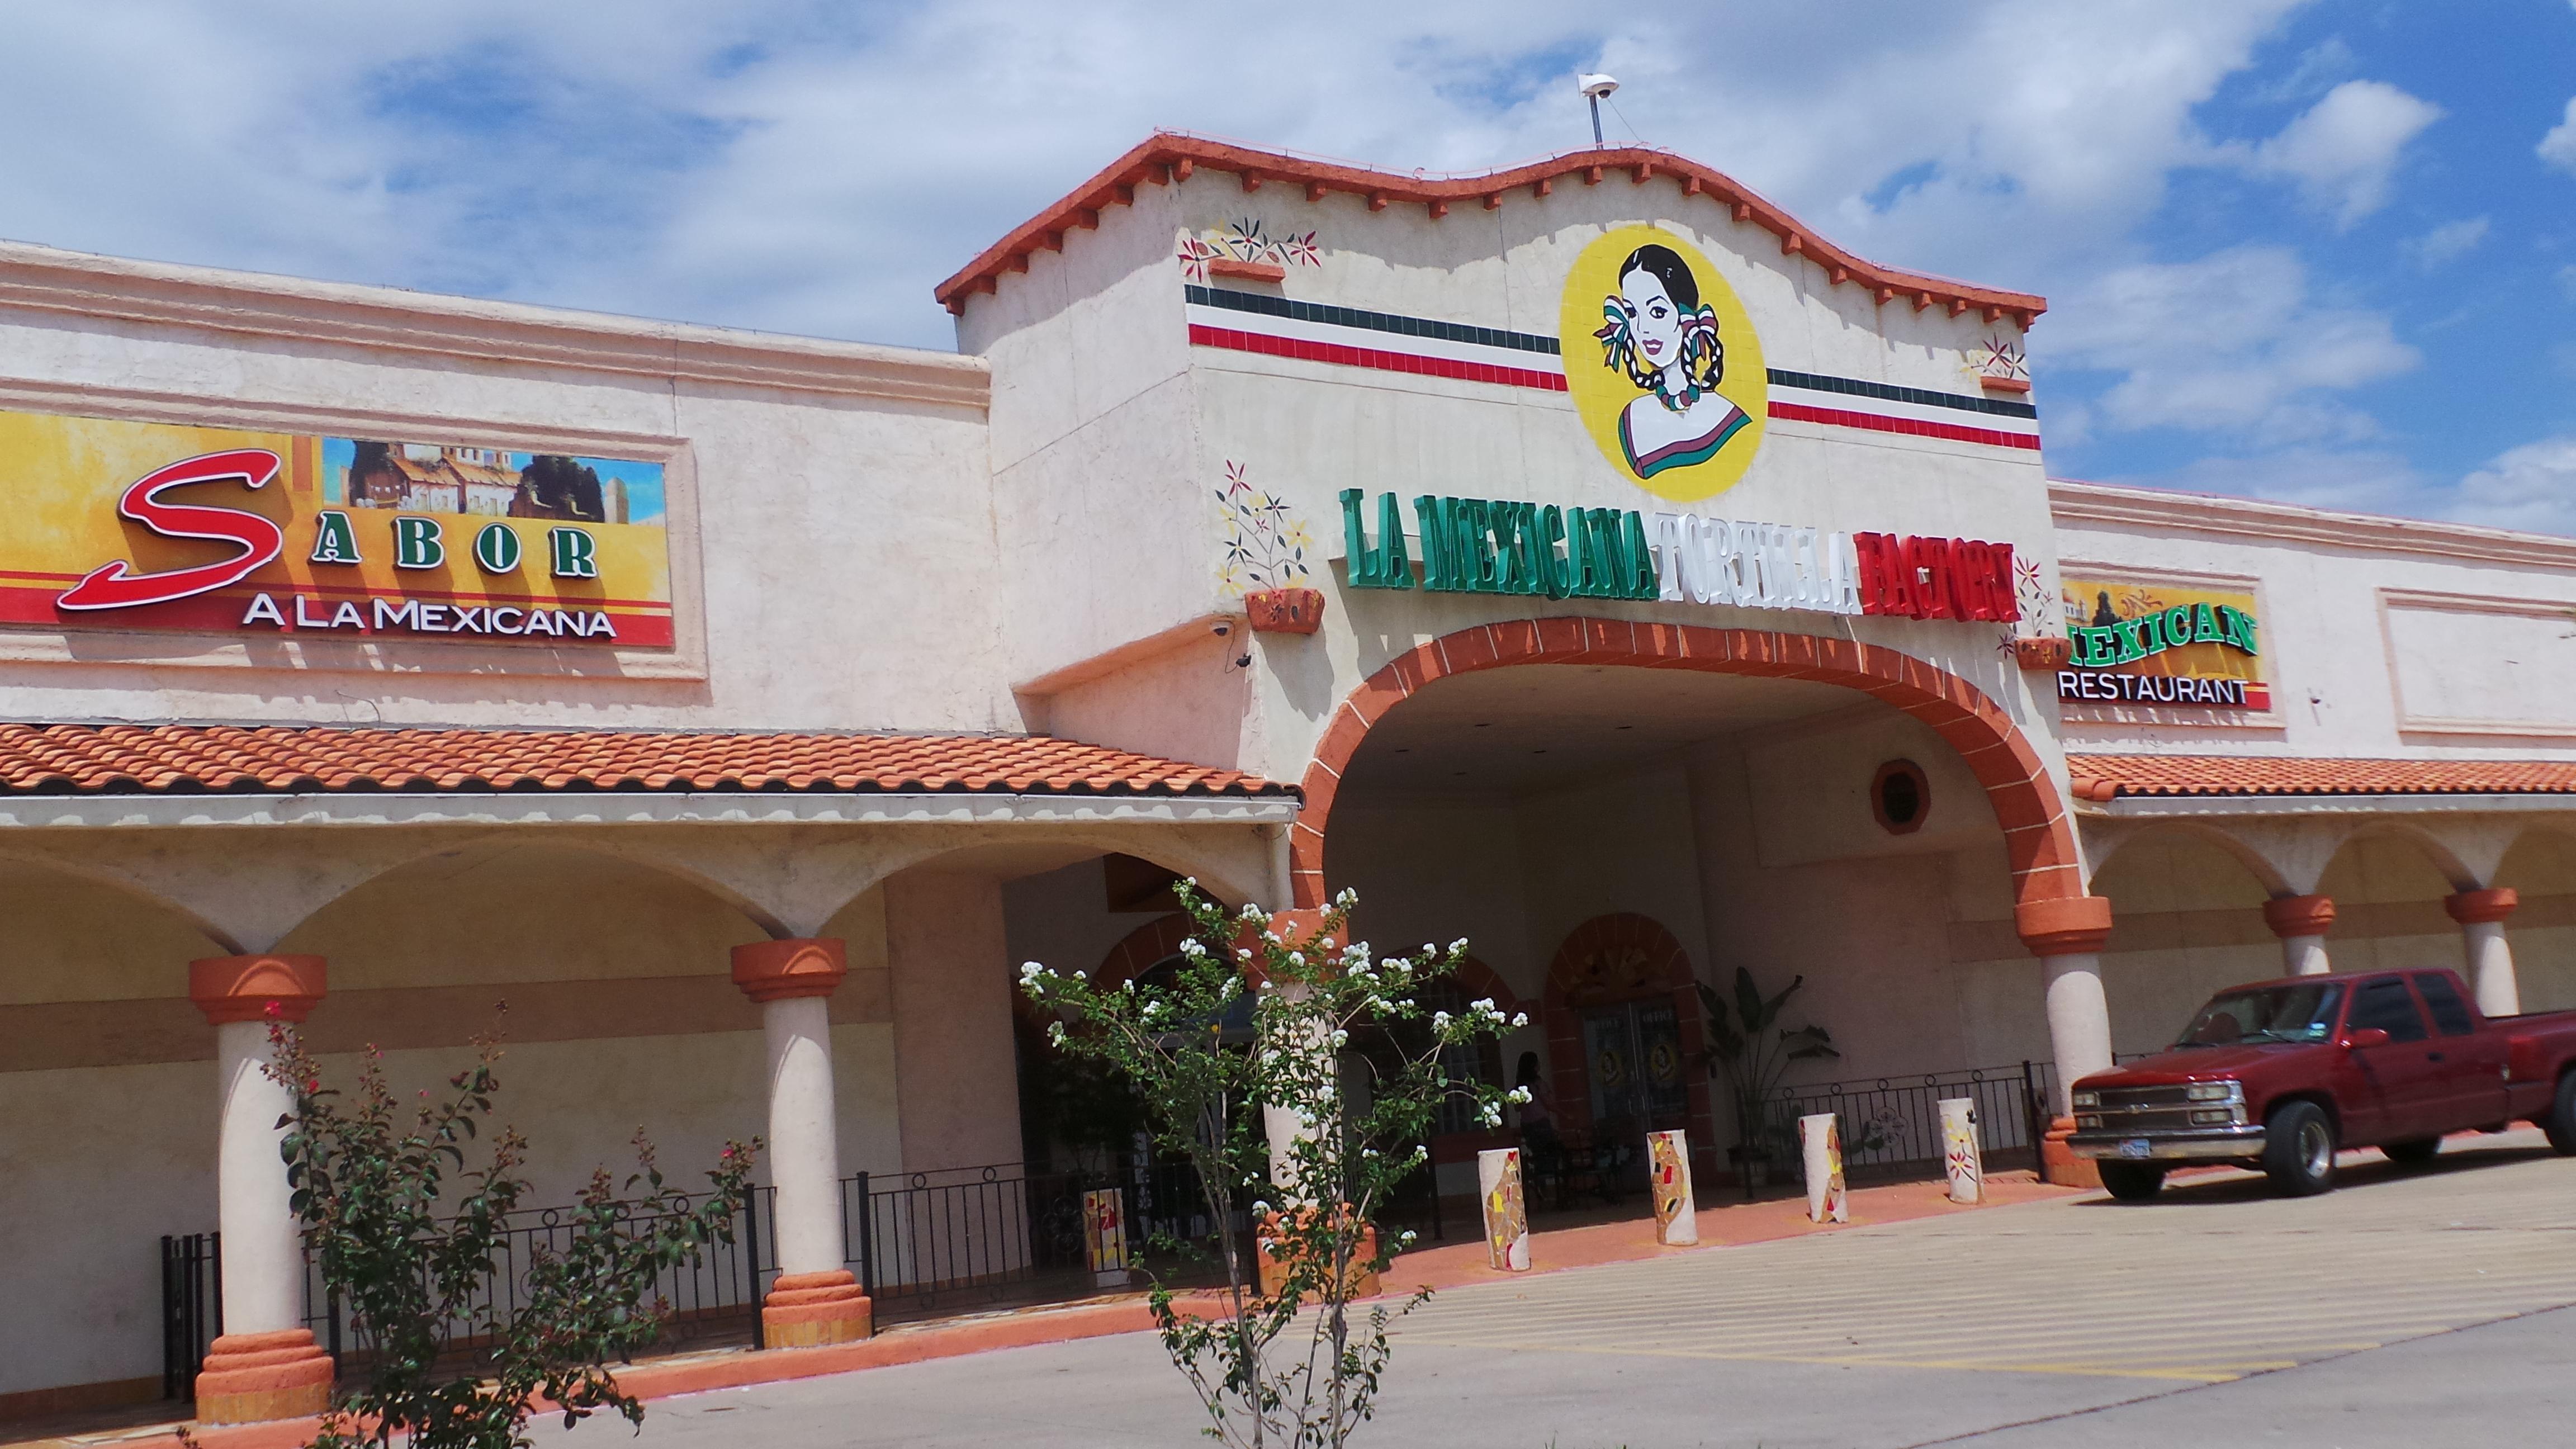 Sabor A La Mexicana Restaurant image 2